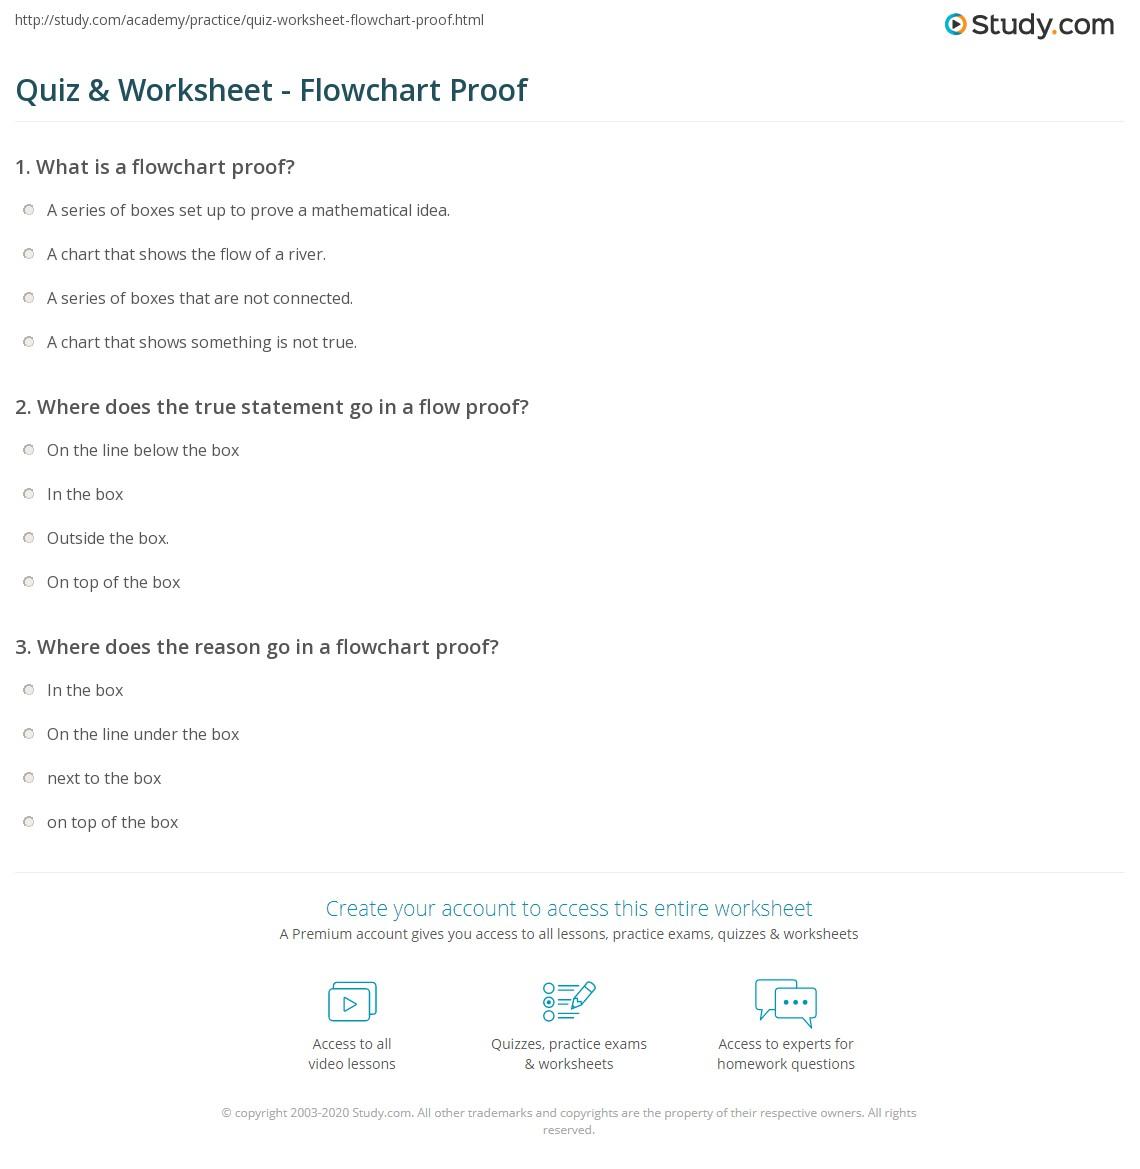 Quiz W Ksheet Flowch Rt Proof Study